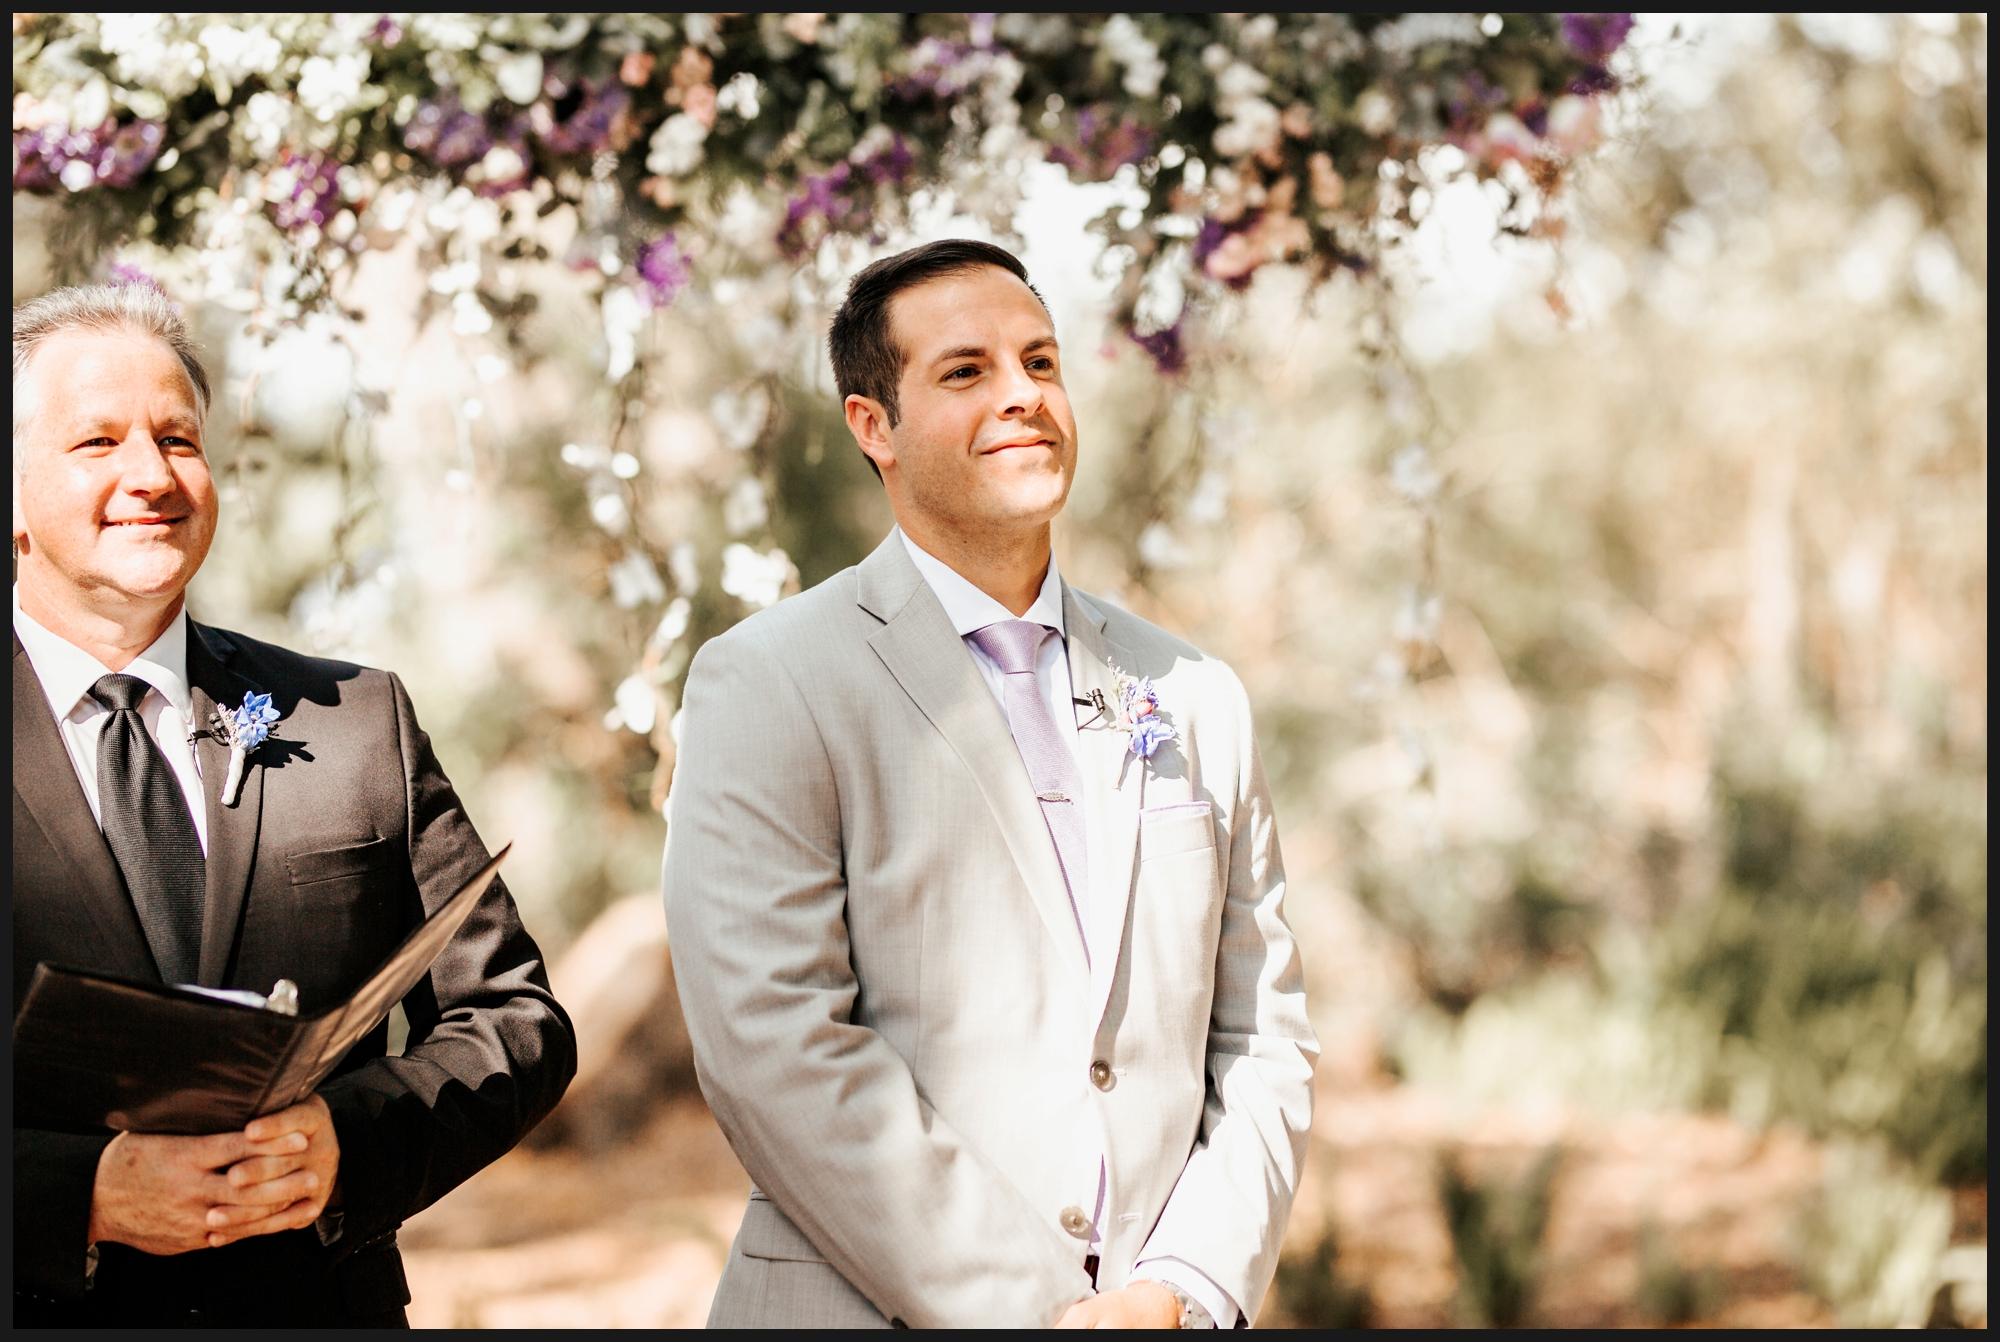 Orlando-Wedding-Photographer-destination-wedding-photographer-florida-wedding-photographer-bohemian-wedding-photographer_1609.jpg